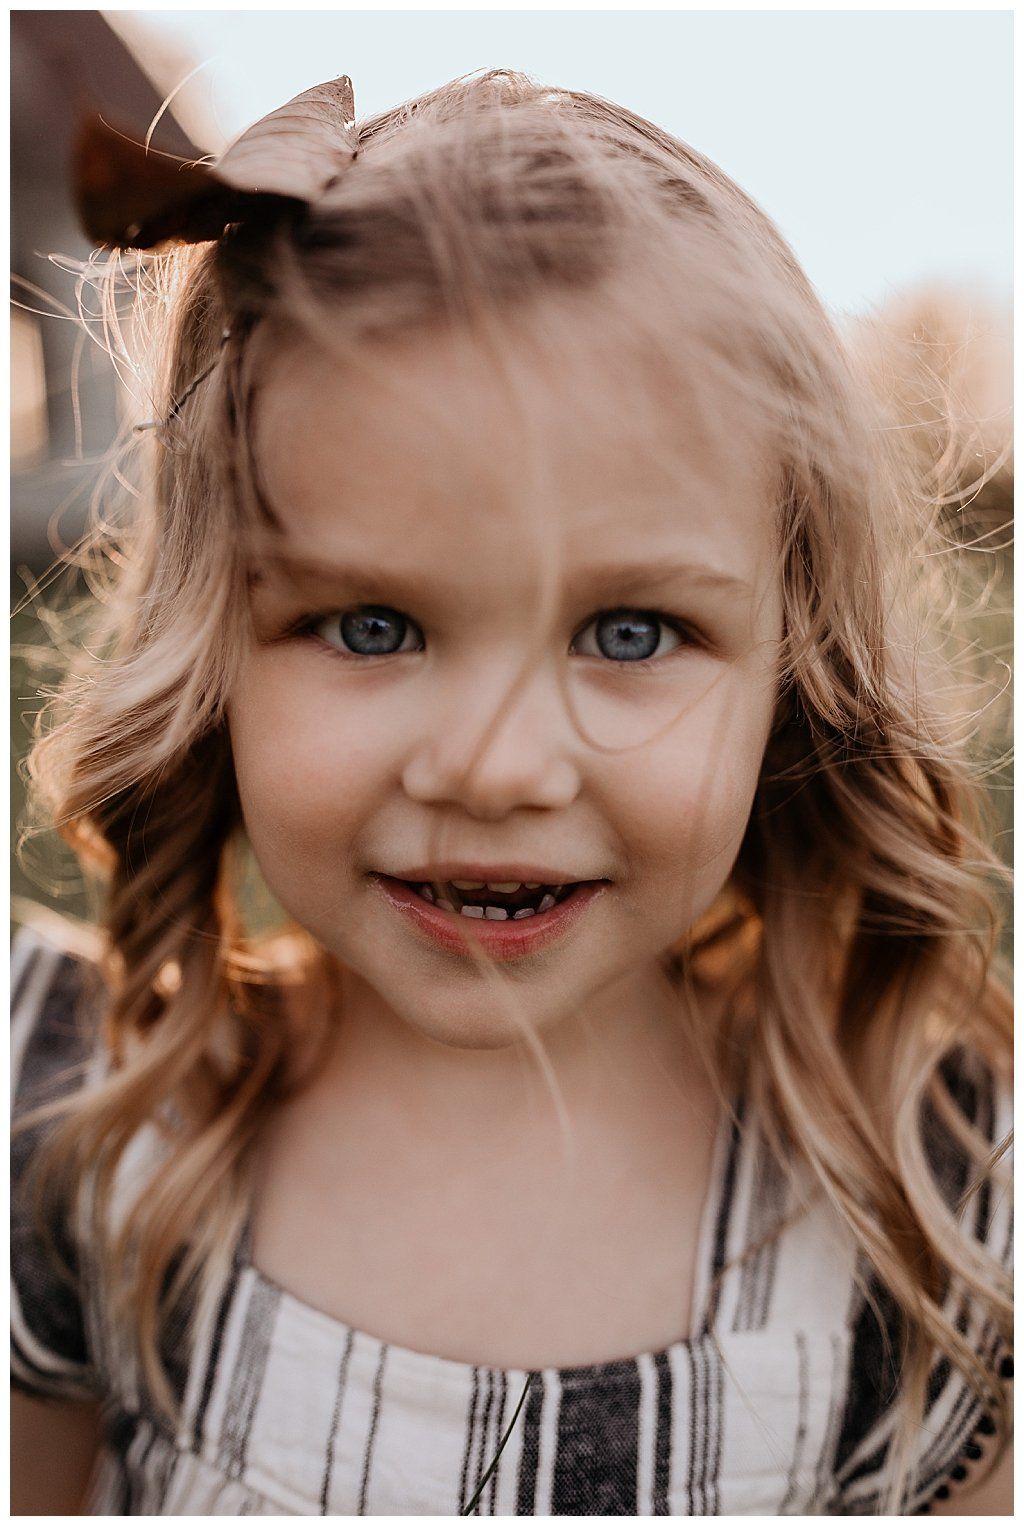 An adorable birthday photoshoot with mylar balloons